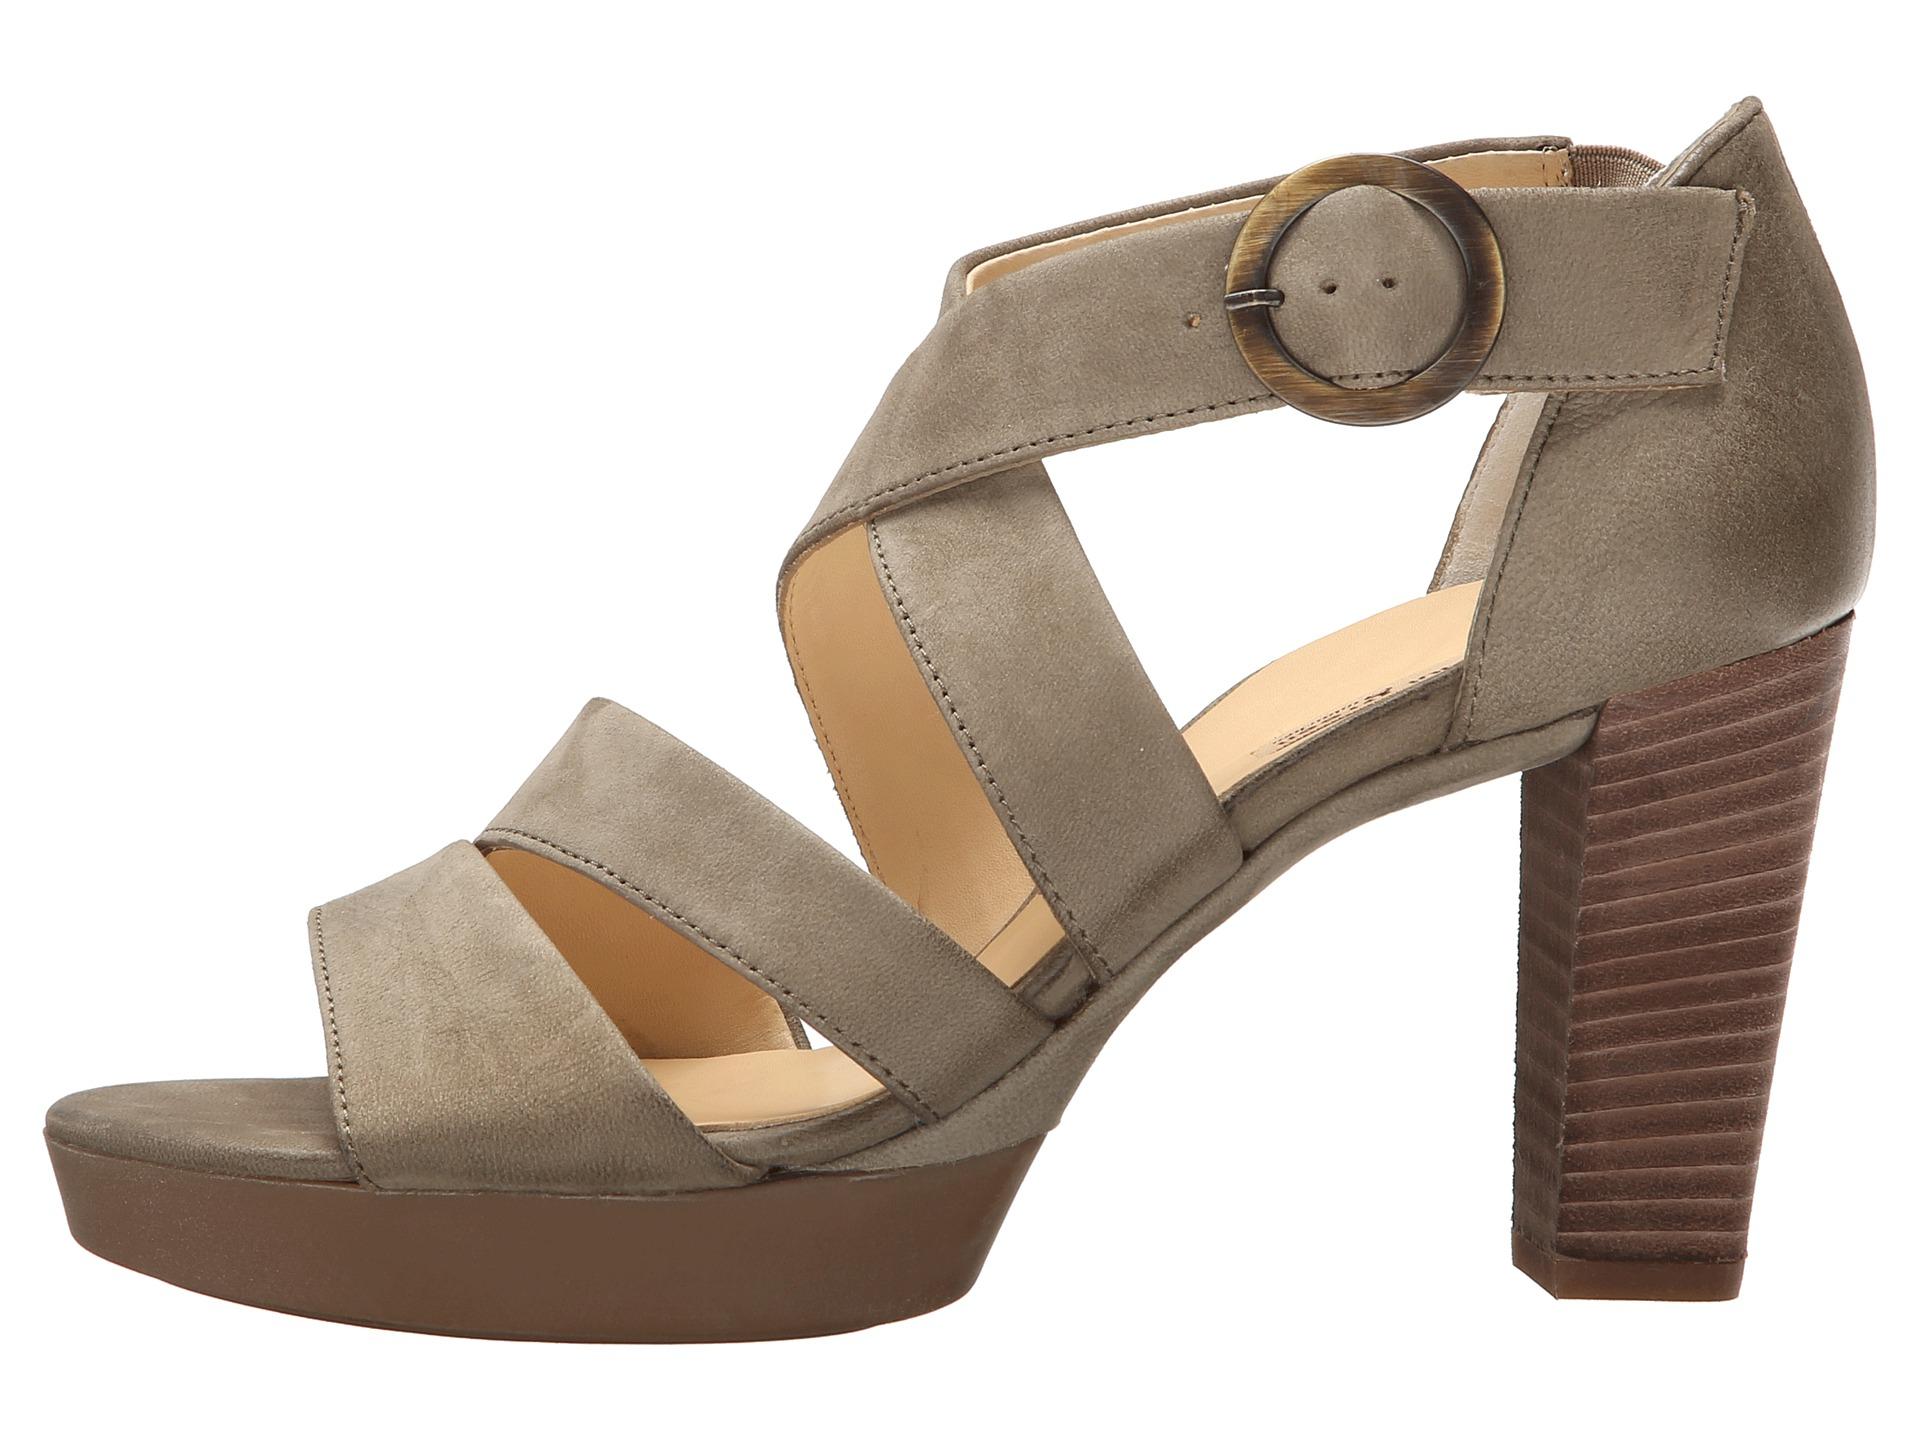 7946c648ff3 Paul Green Platform Sandals.Paul Green Taylor Sandal In Green Lyst ...